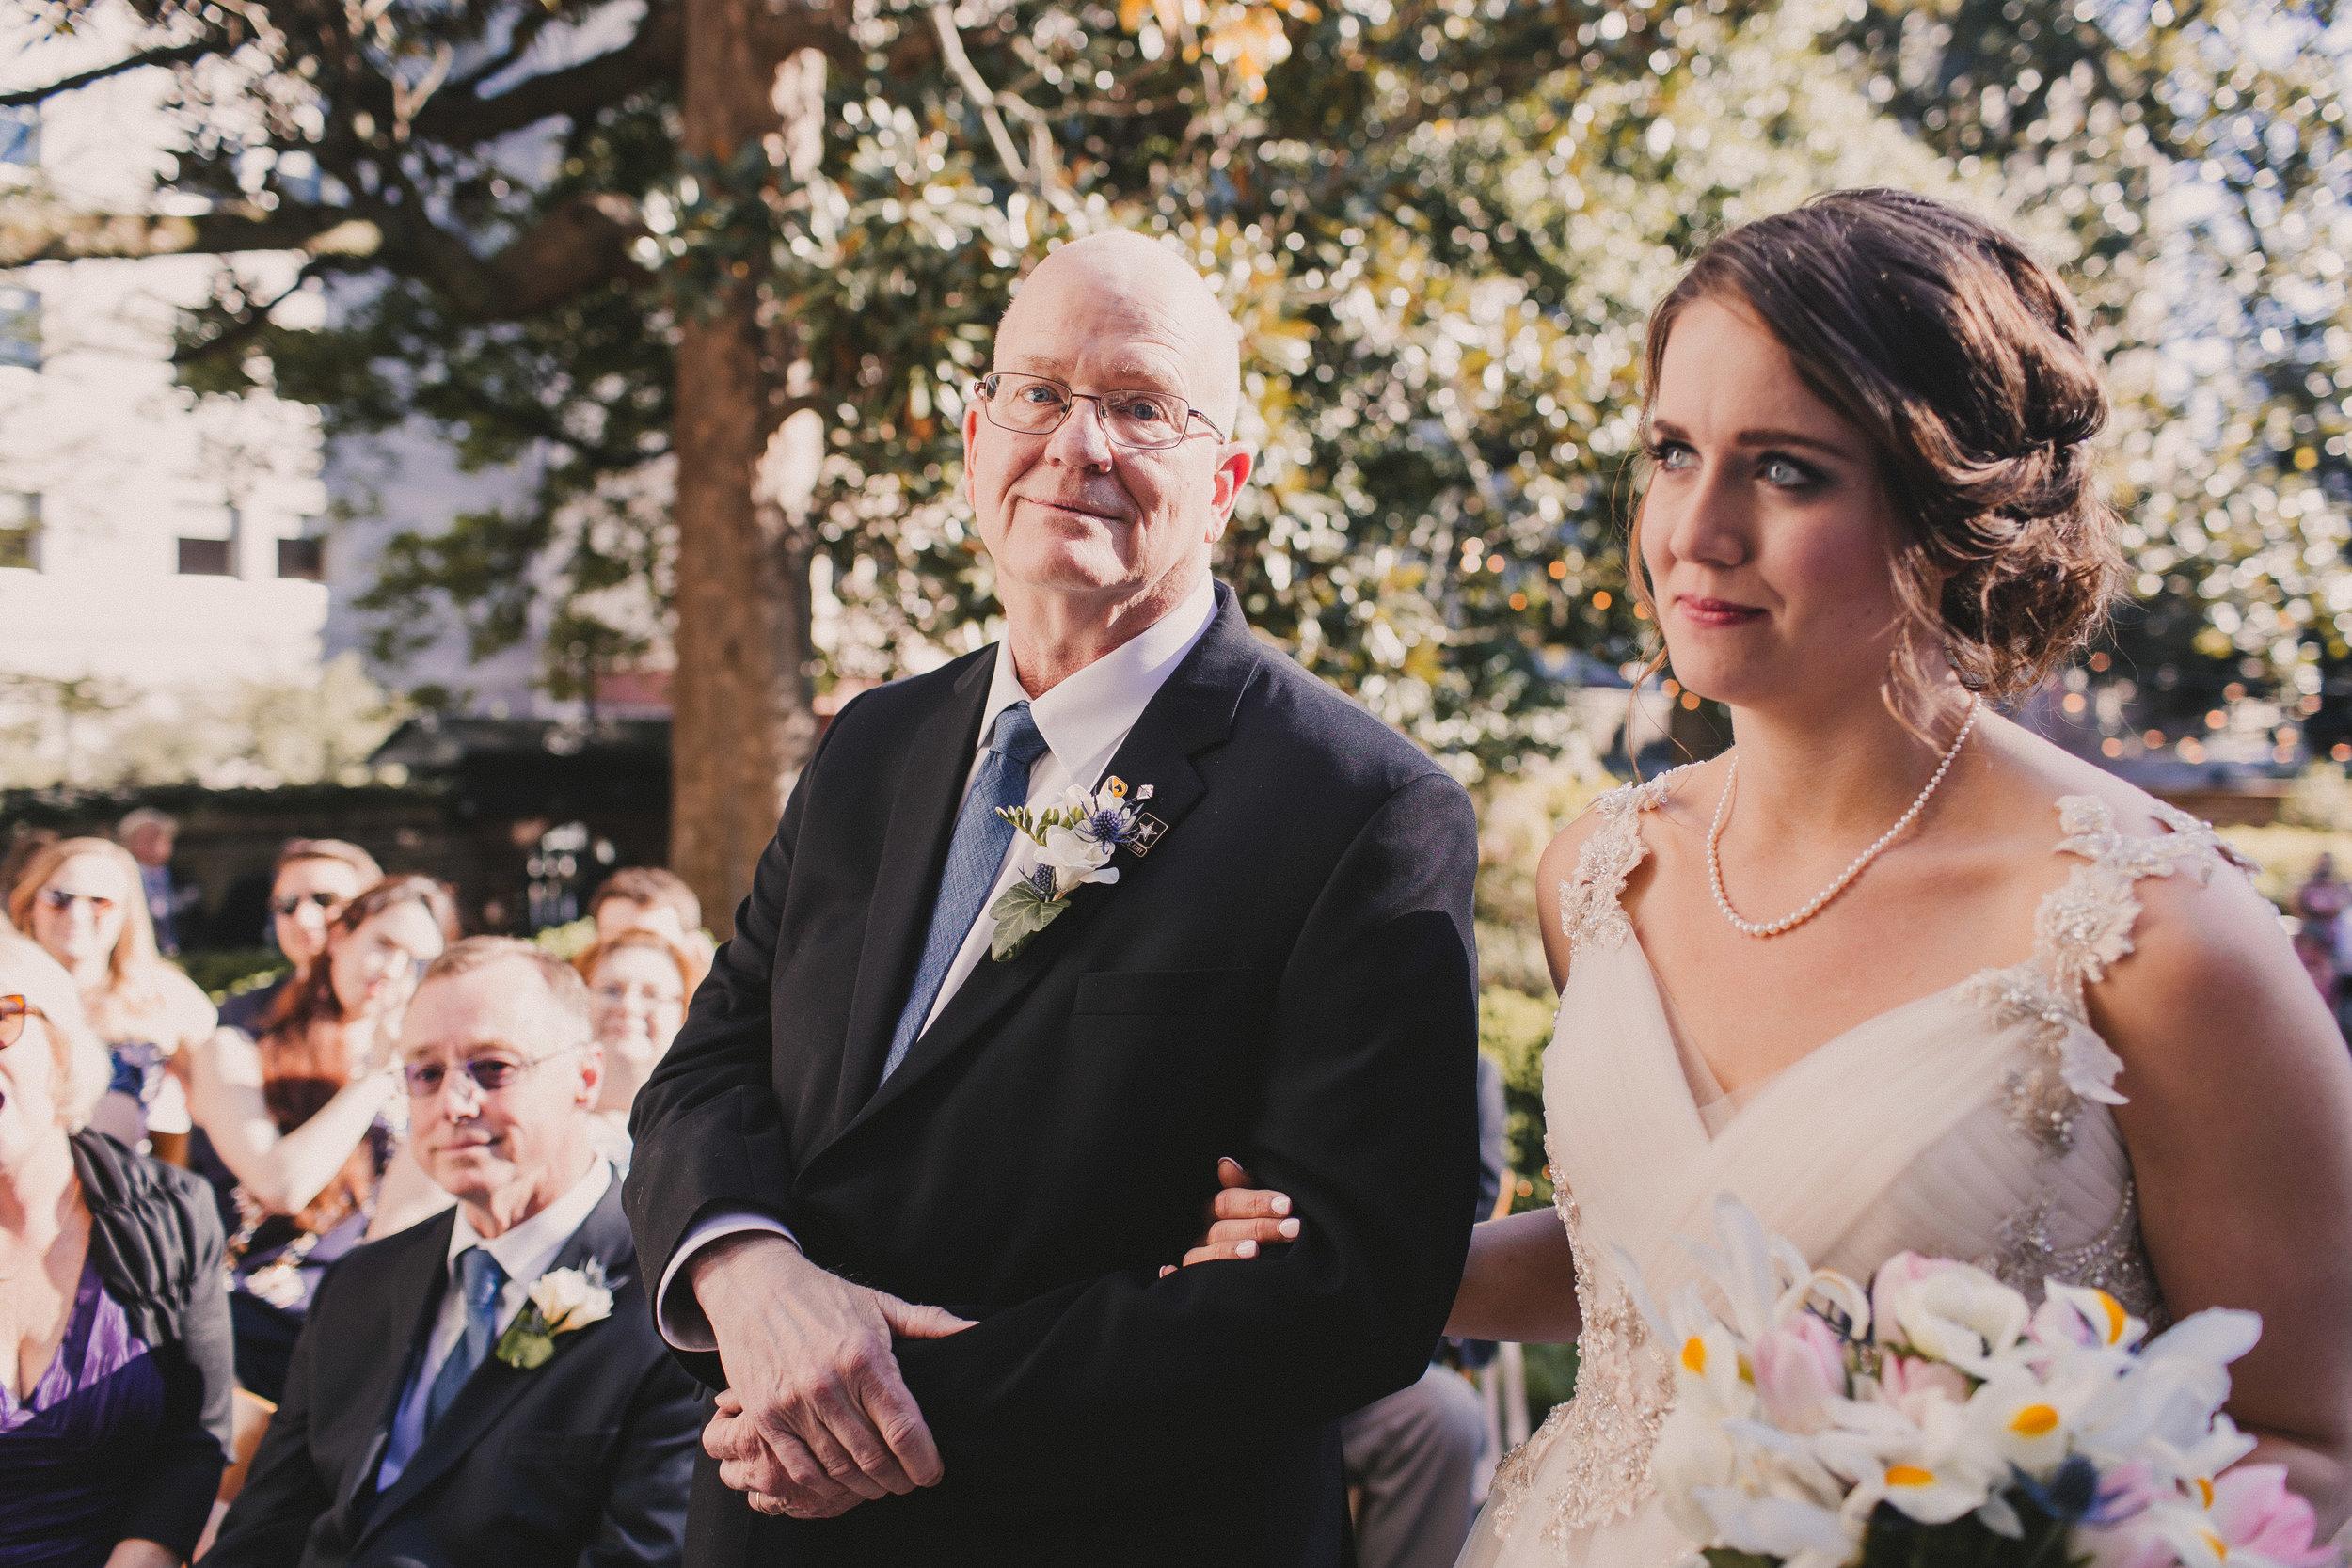 Lindsey & Bert - Wedding 4.1.17-595.jpg